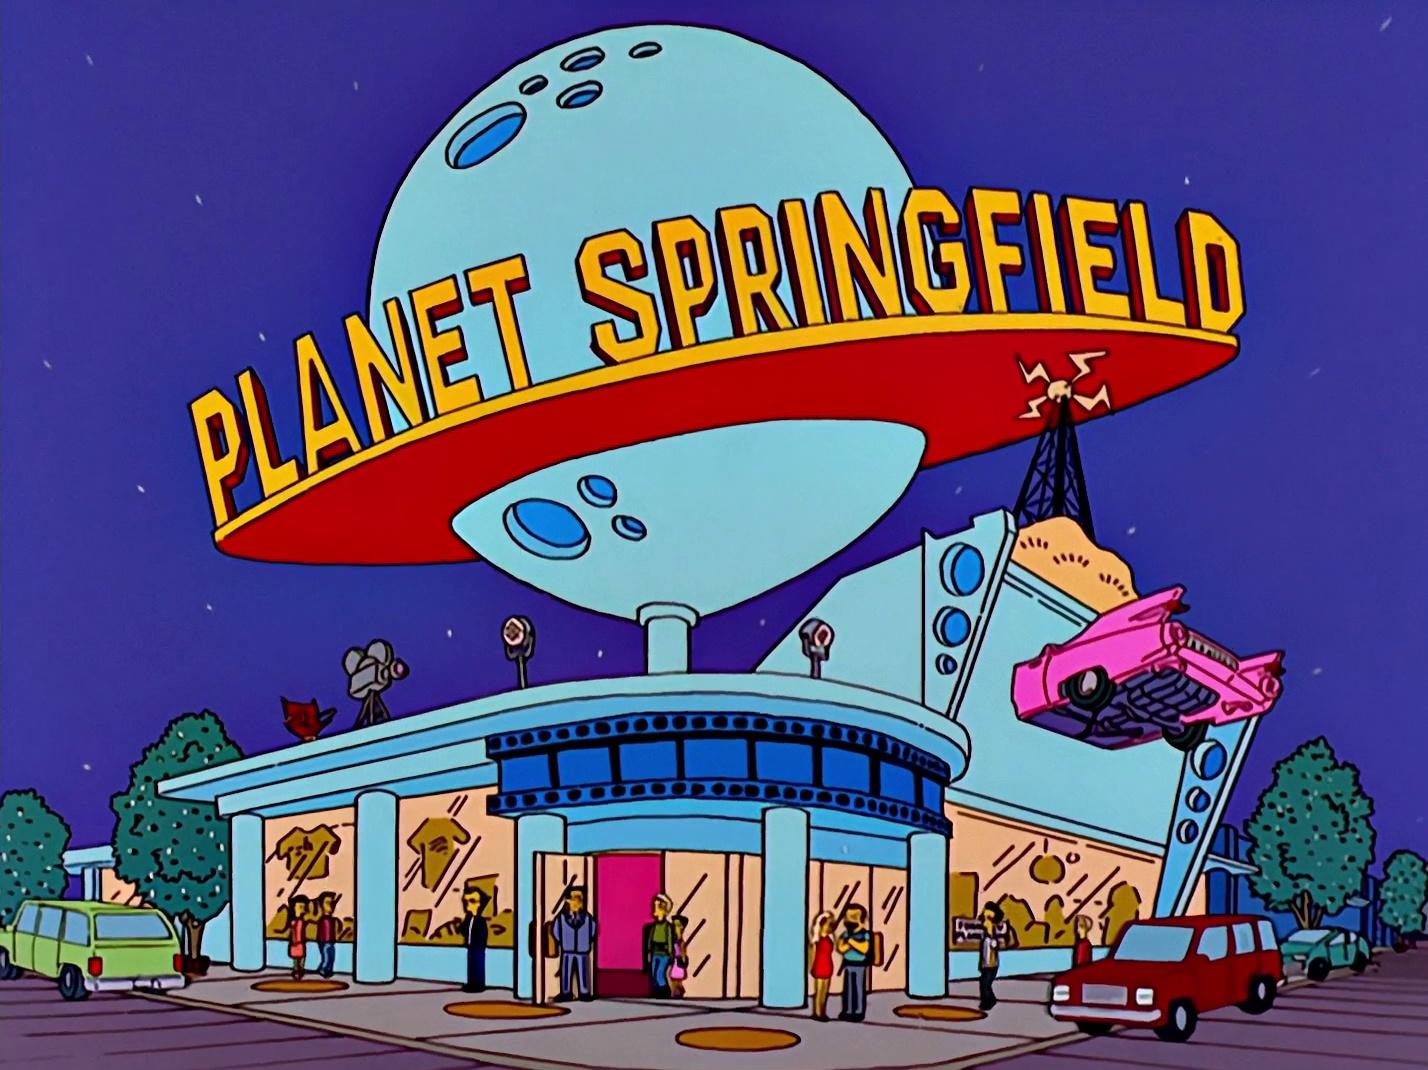 File:Planet springfield.jpg